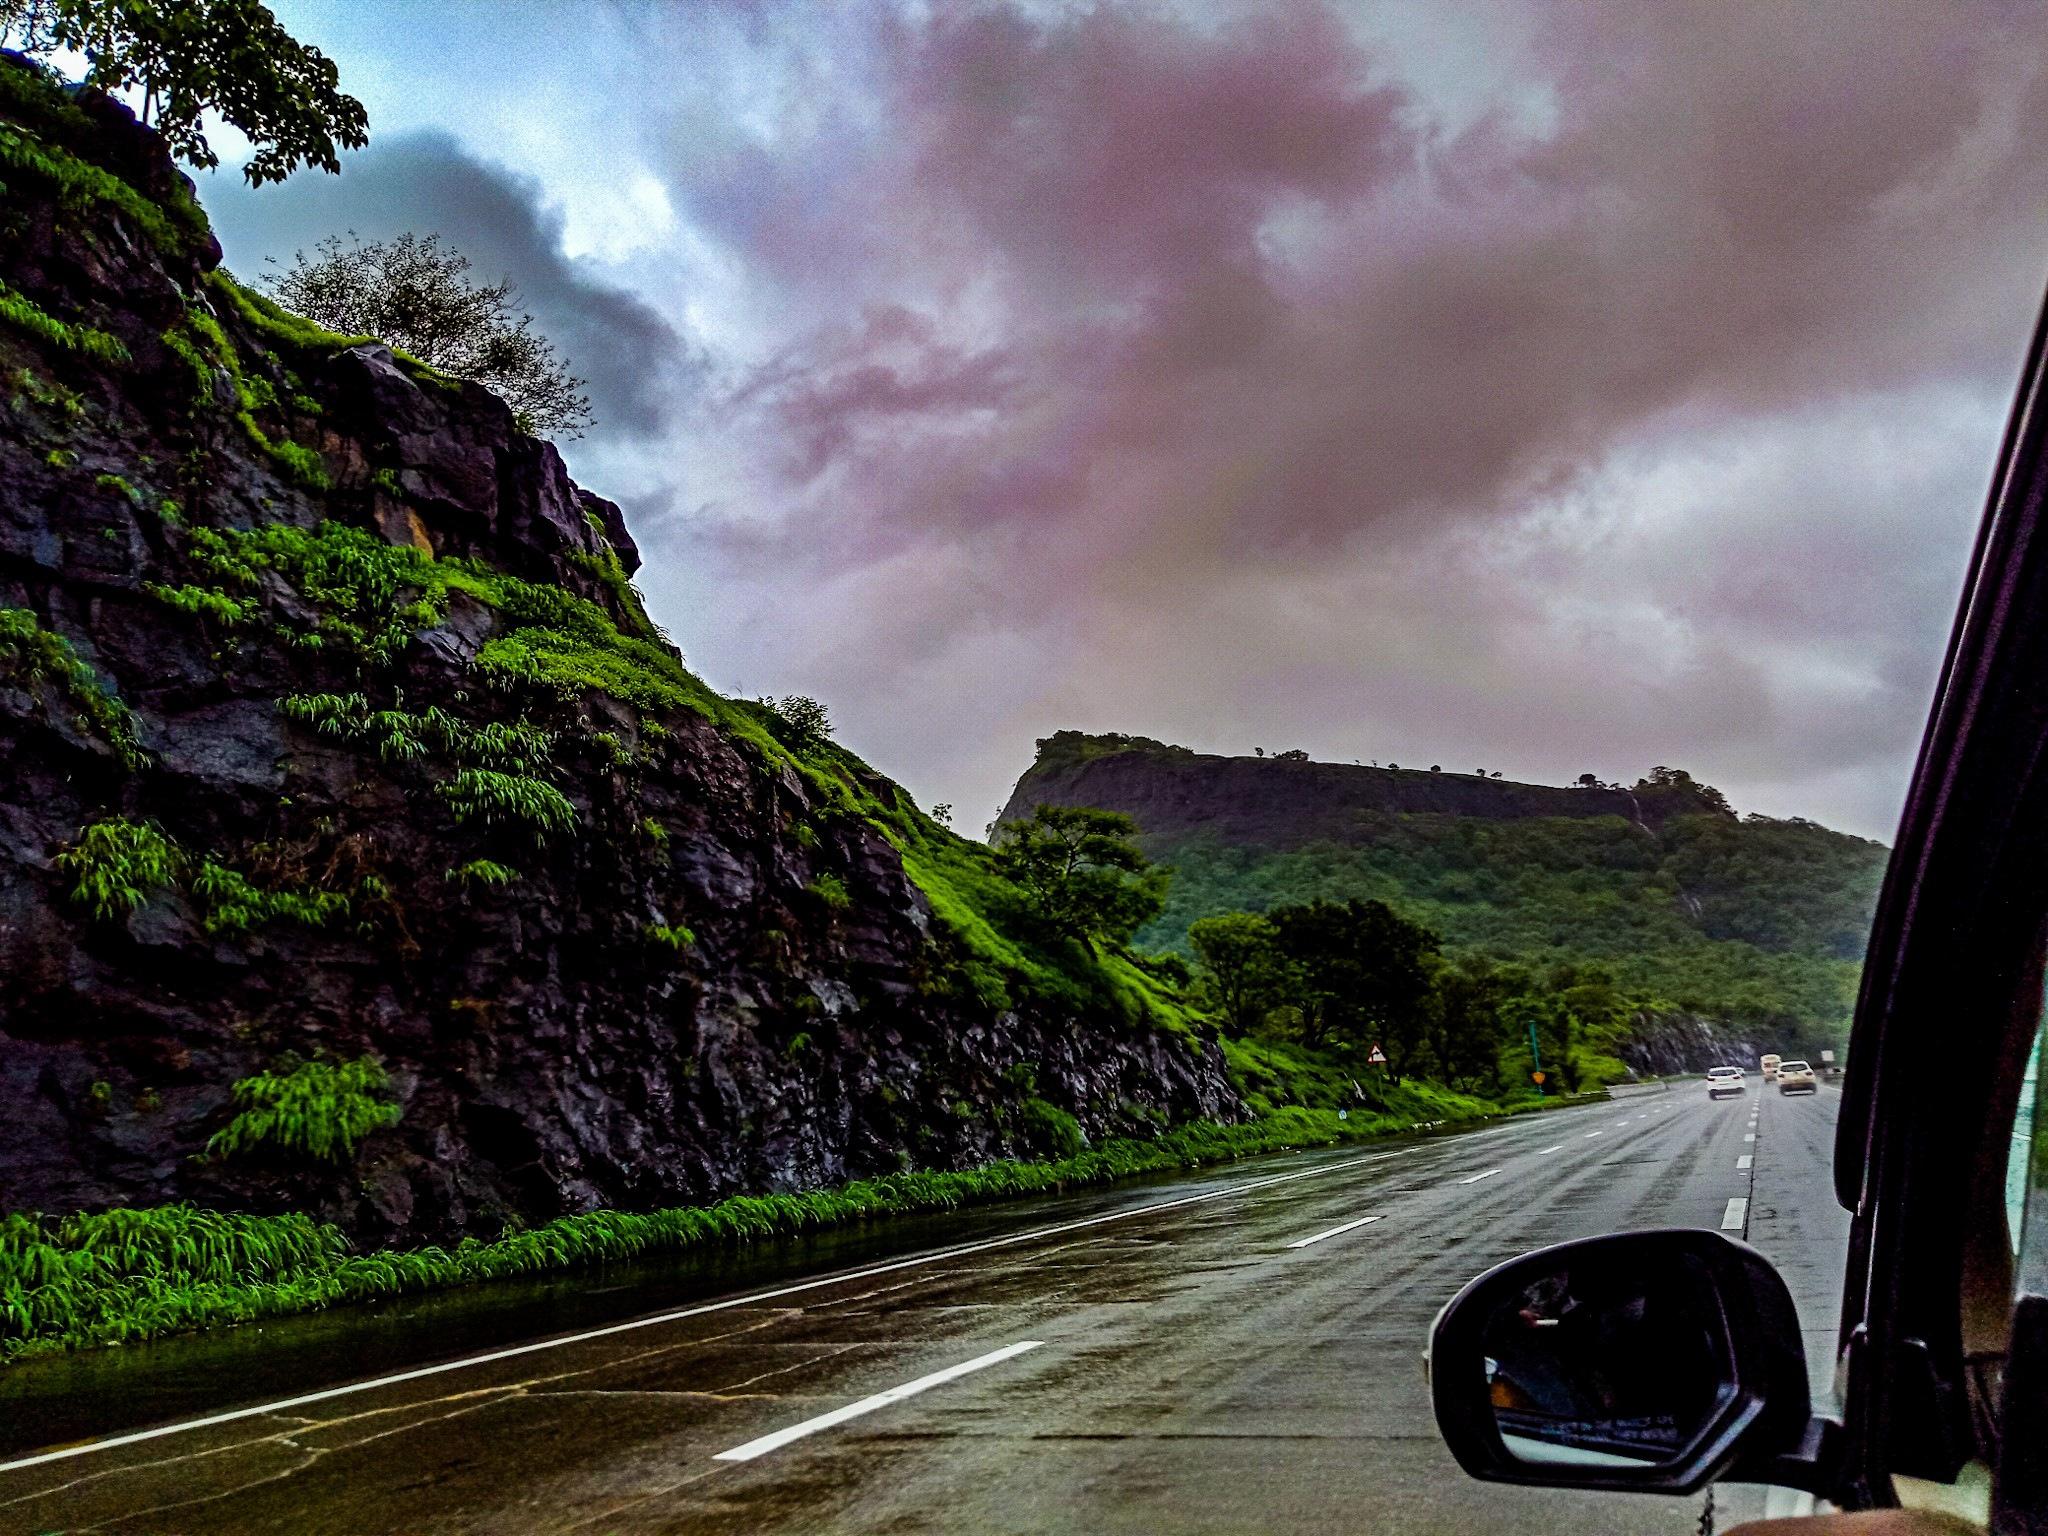 Travel memories  by Devansh barot